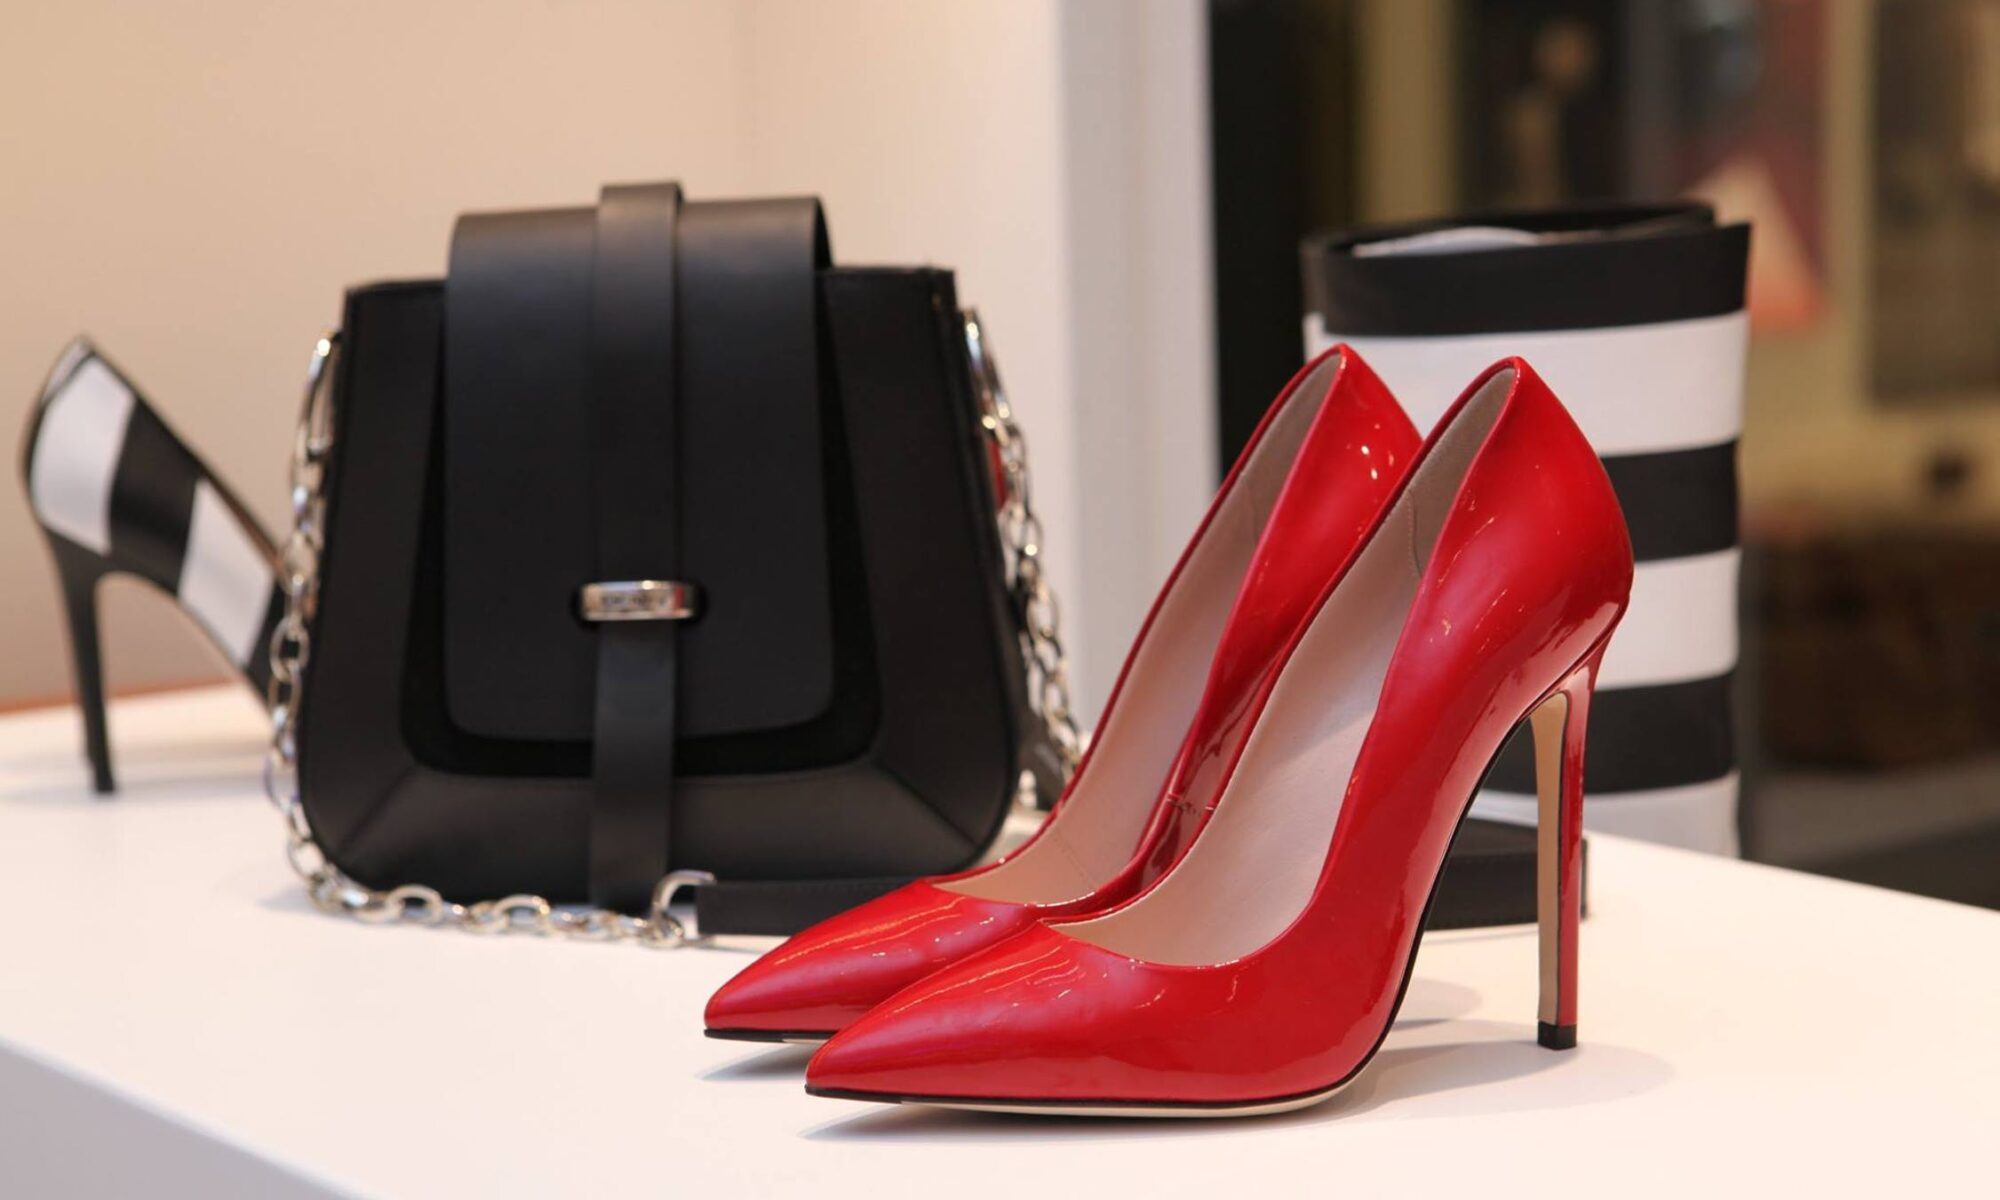 de røde sko analyse